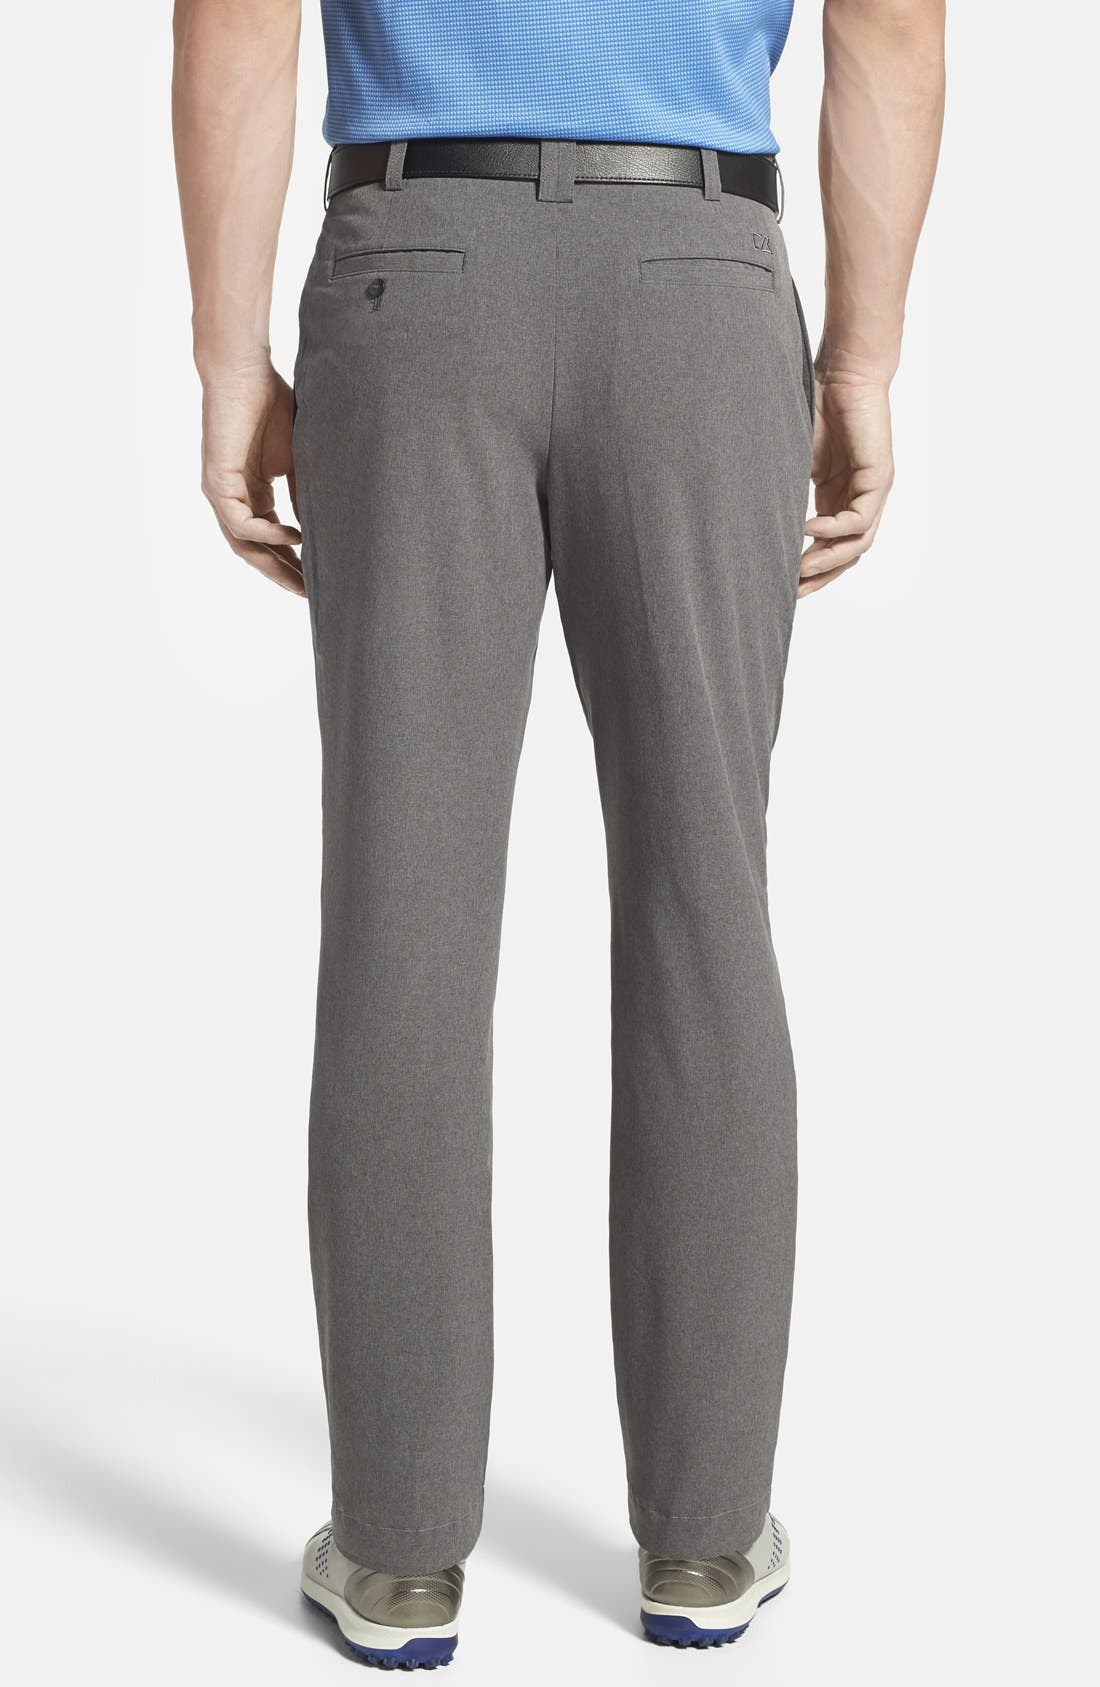 CUTTER & BUCK, 'Bainbridge' DryTec Flat Front Pants, Alternate thumbnail 2, color, IRON GREY